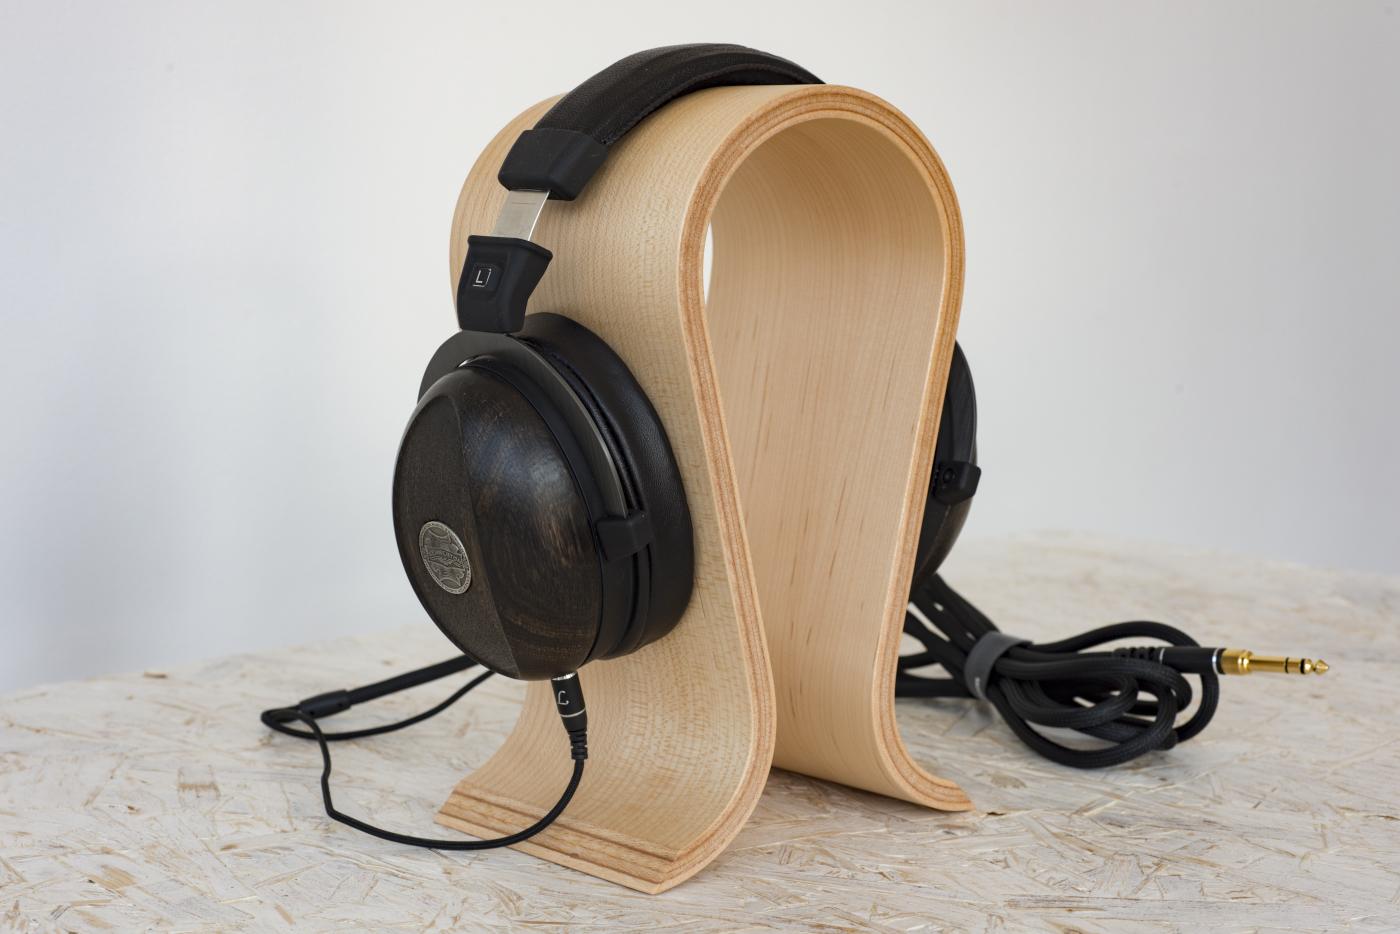 Kennerton Magister Headphones Sieveking Headphone Stand